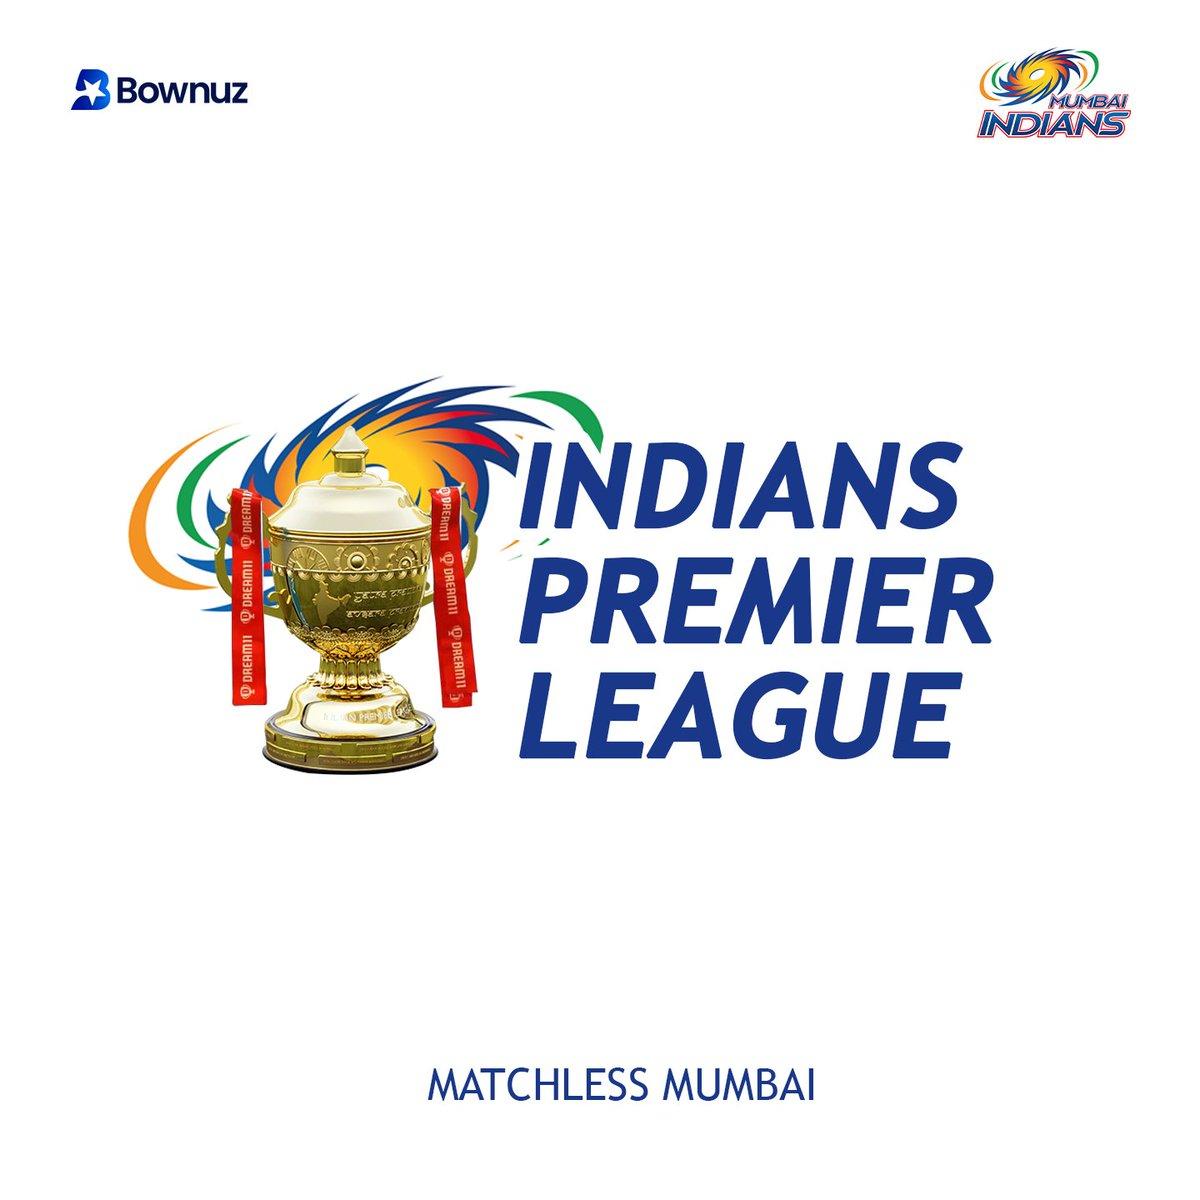 Bownuz congratulates Mumbai Indians on their spectacular triumph.  #MIChampion5 #DCvMI #mumbaiindians #mi #rohitsharma #rohitsharma45 #rohit  #ipl #IPL2020 #hardikpandya #ishankishan #suryakumaryadav #jaspritbumrah #iplfinal #finalmatch #onefamily #paltan #rahulchahar